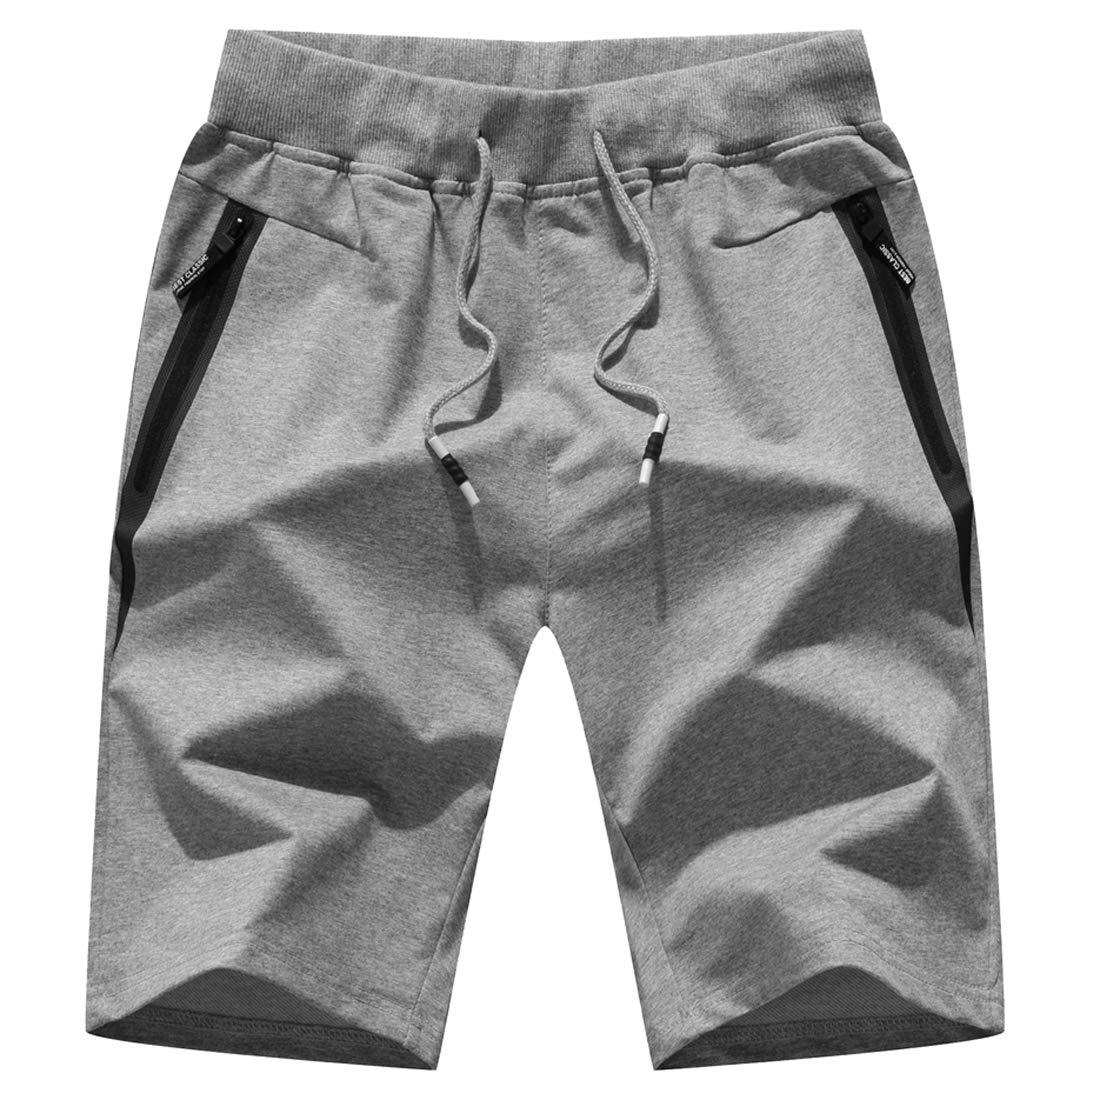 JustSun - Pantalón Corto - para Hombre Gris Gris Claro X-Large